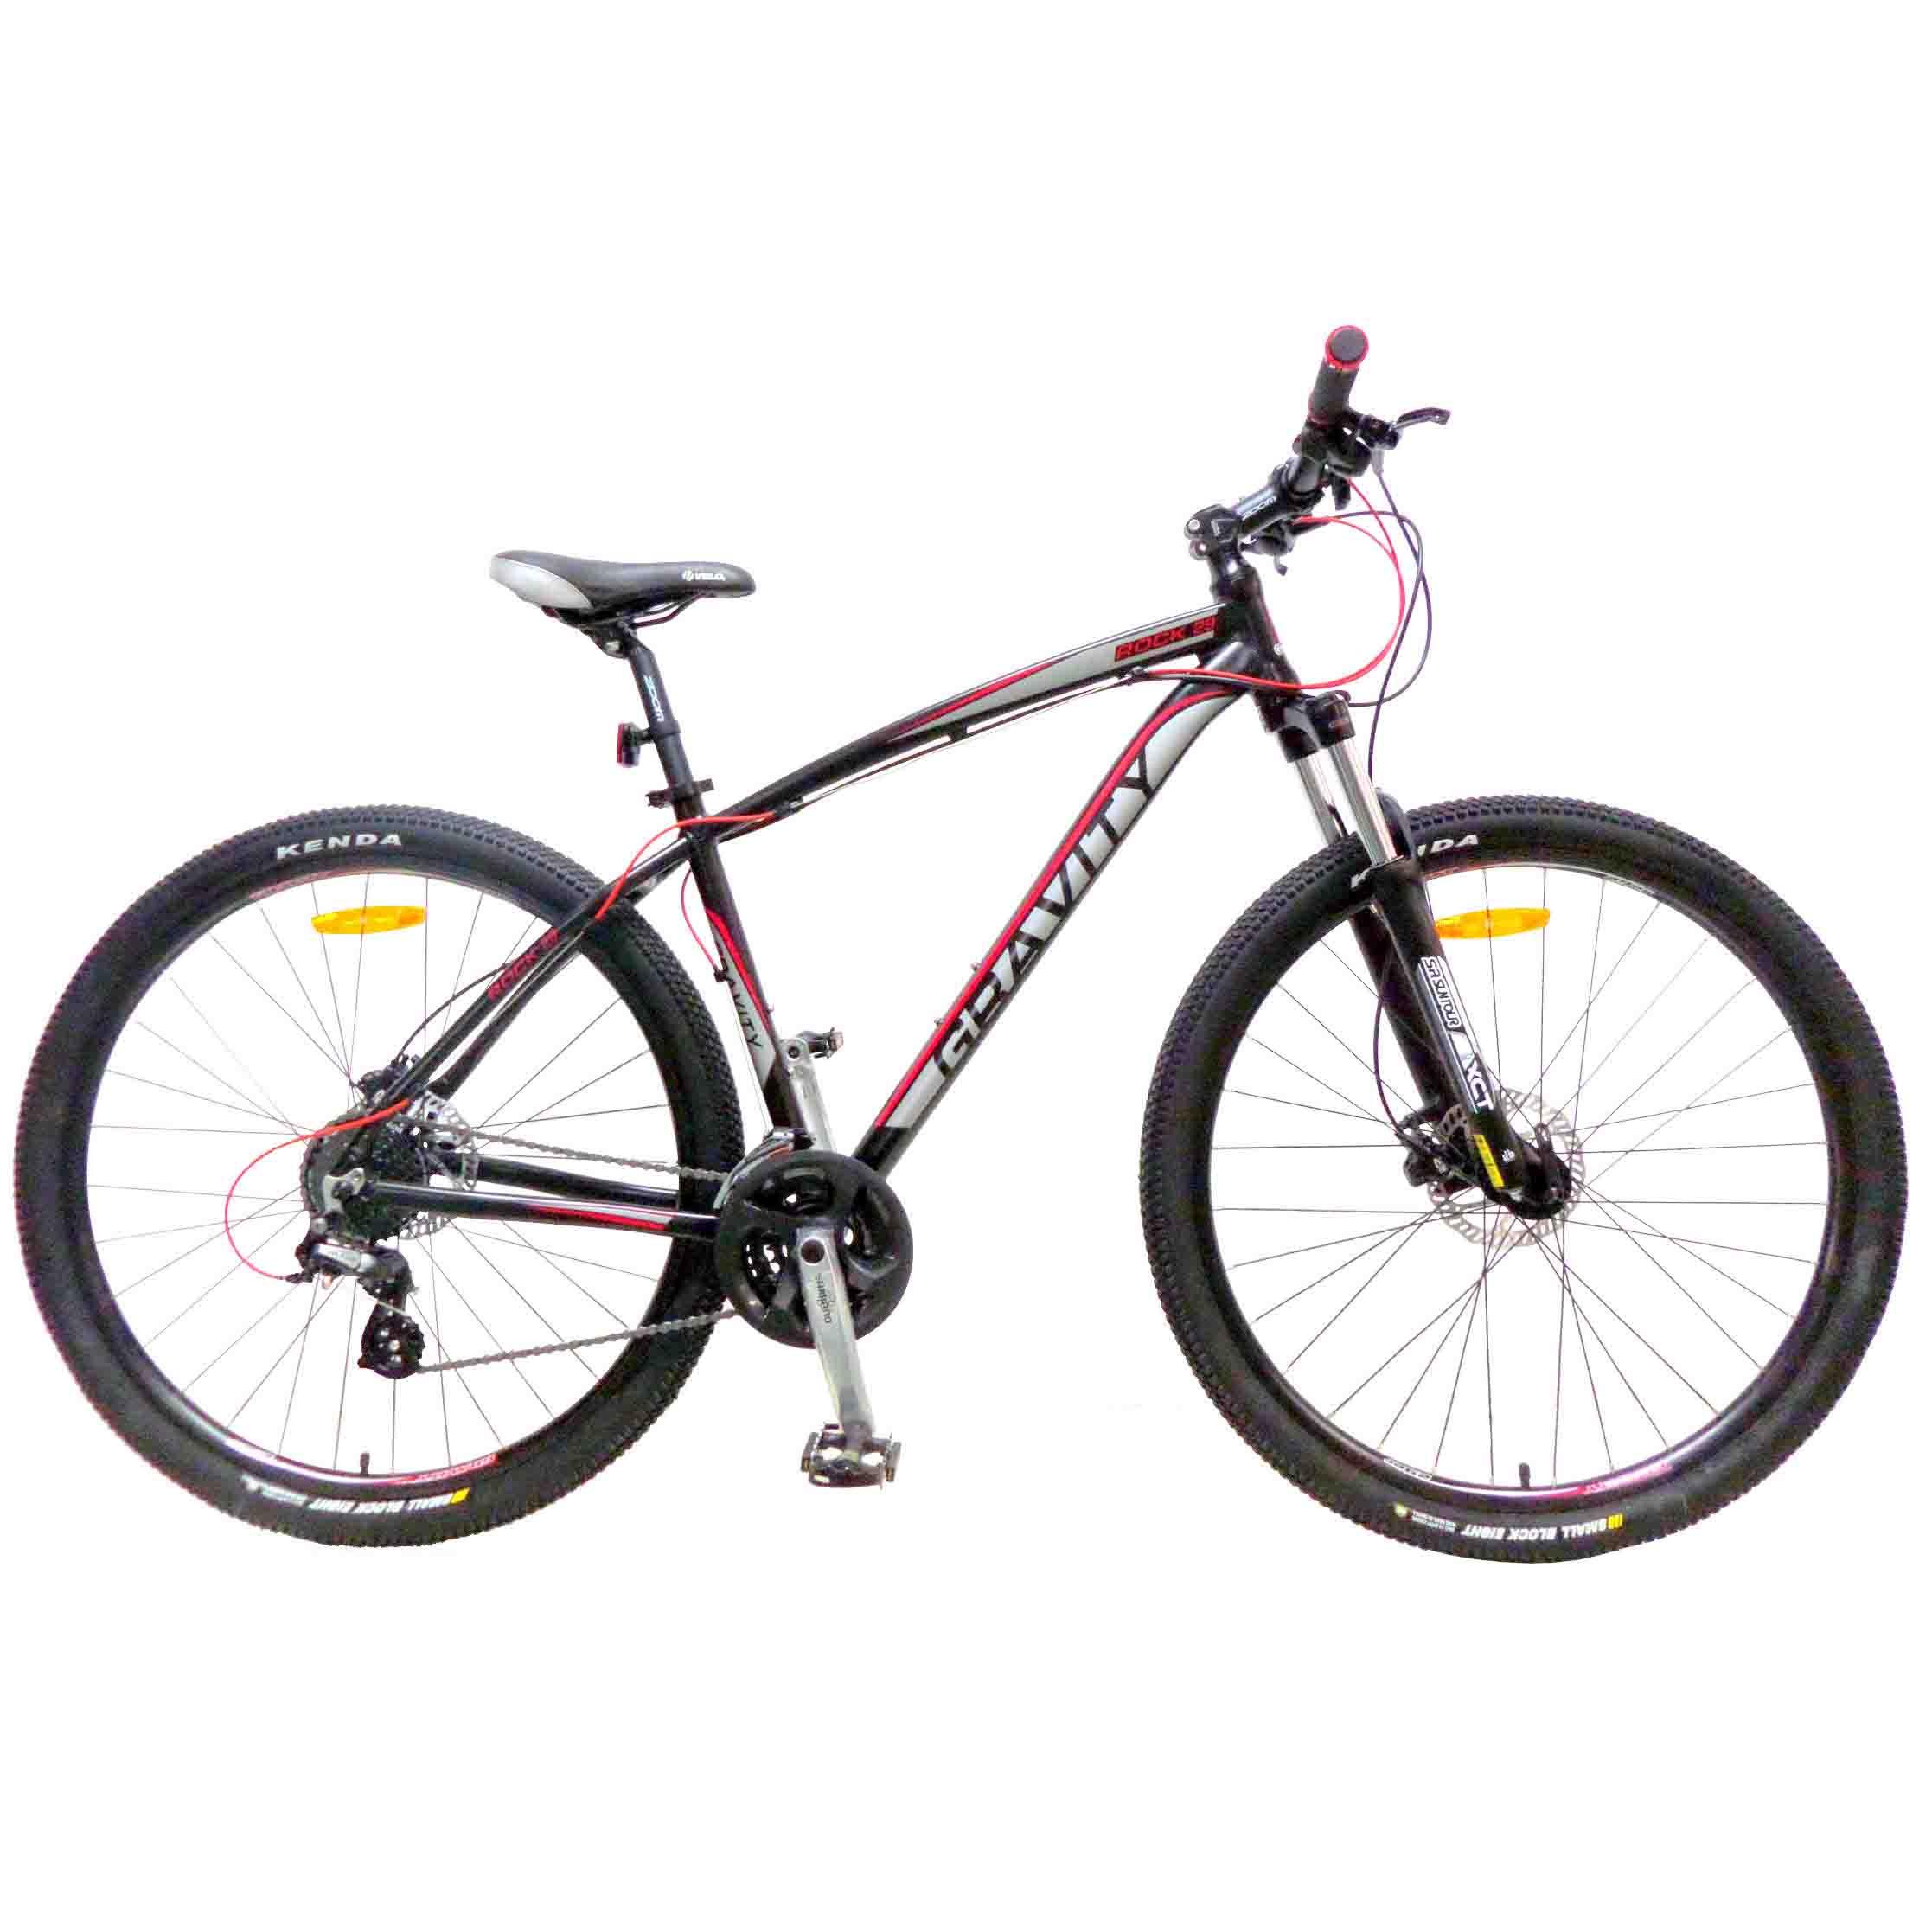 "Велосипед Gravity 29"" ROCK 24 скор. алюм.рама 19"" гидр.диск.торм. серый (7316) УЦЕНКА!!! 270917"